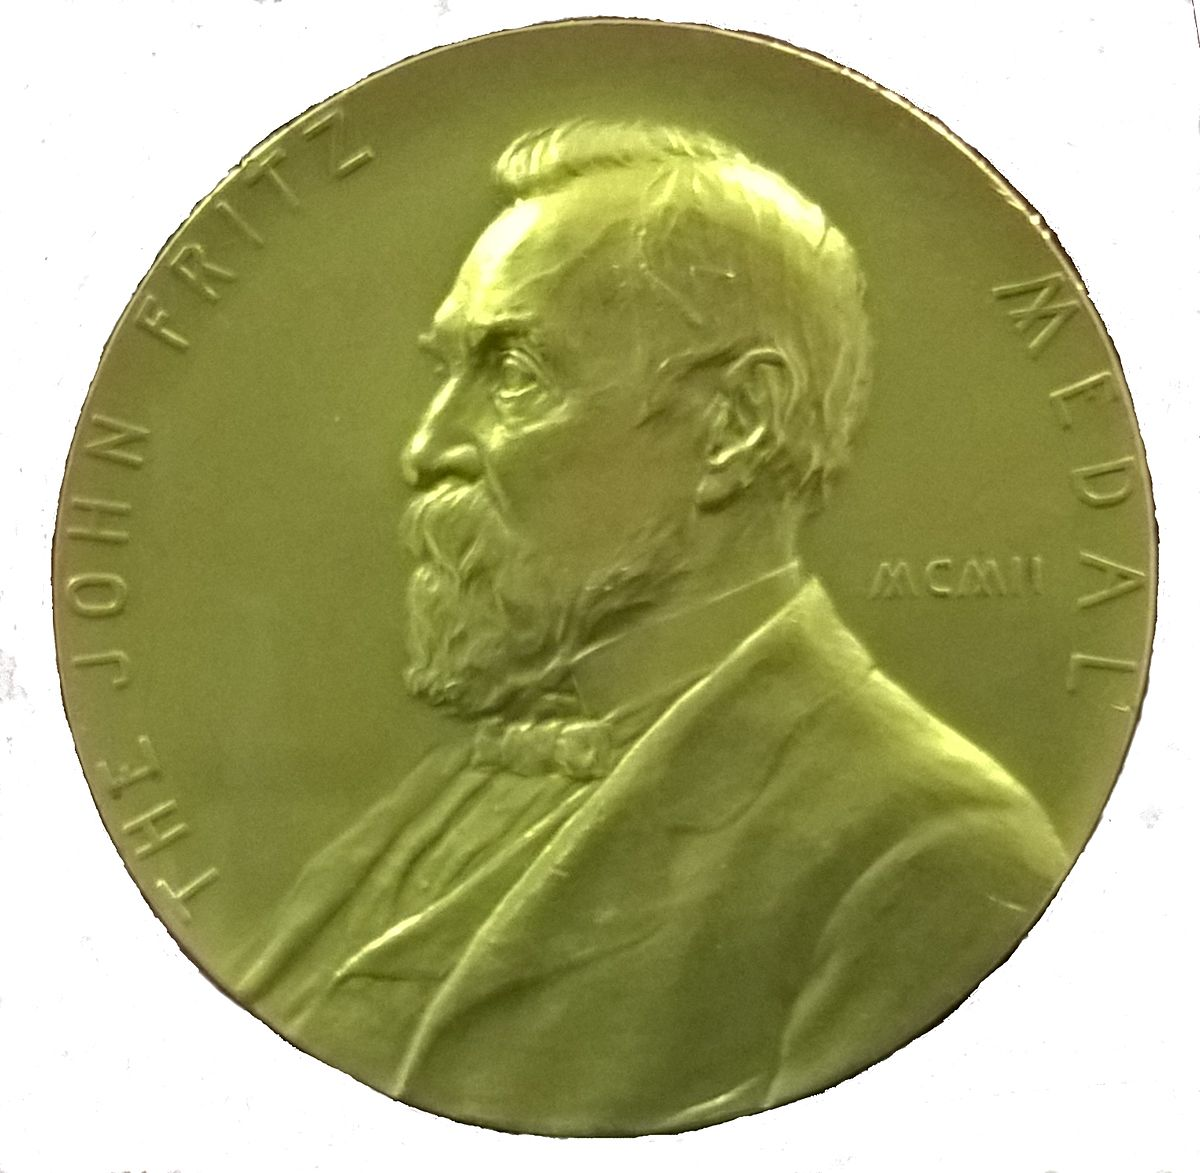 John Fritz Medal Wikipedia